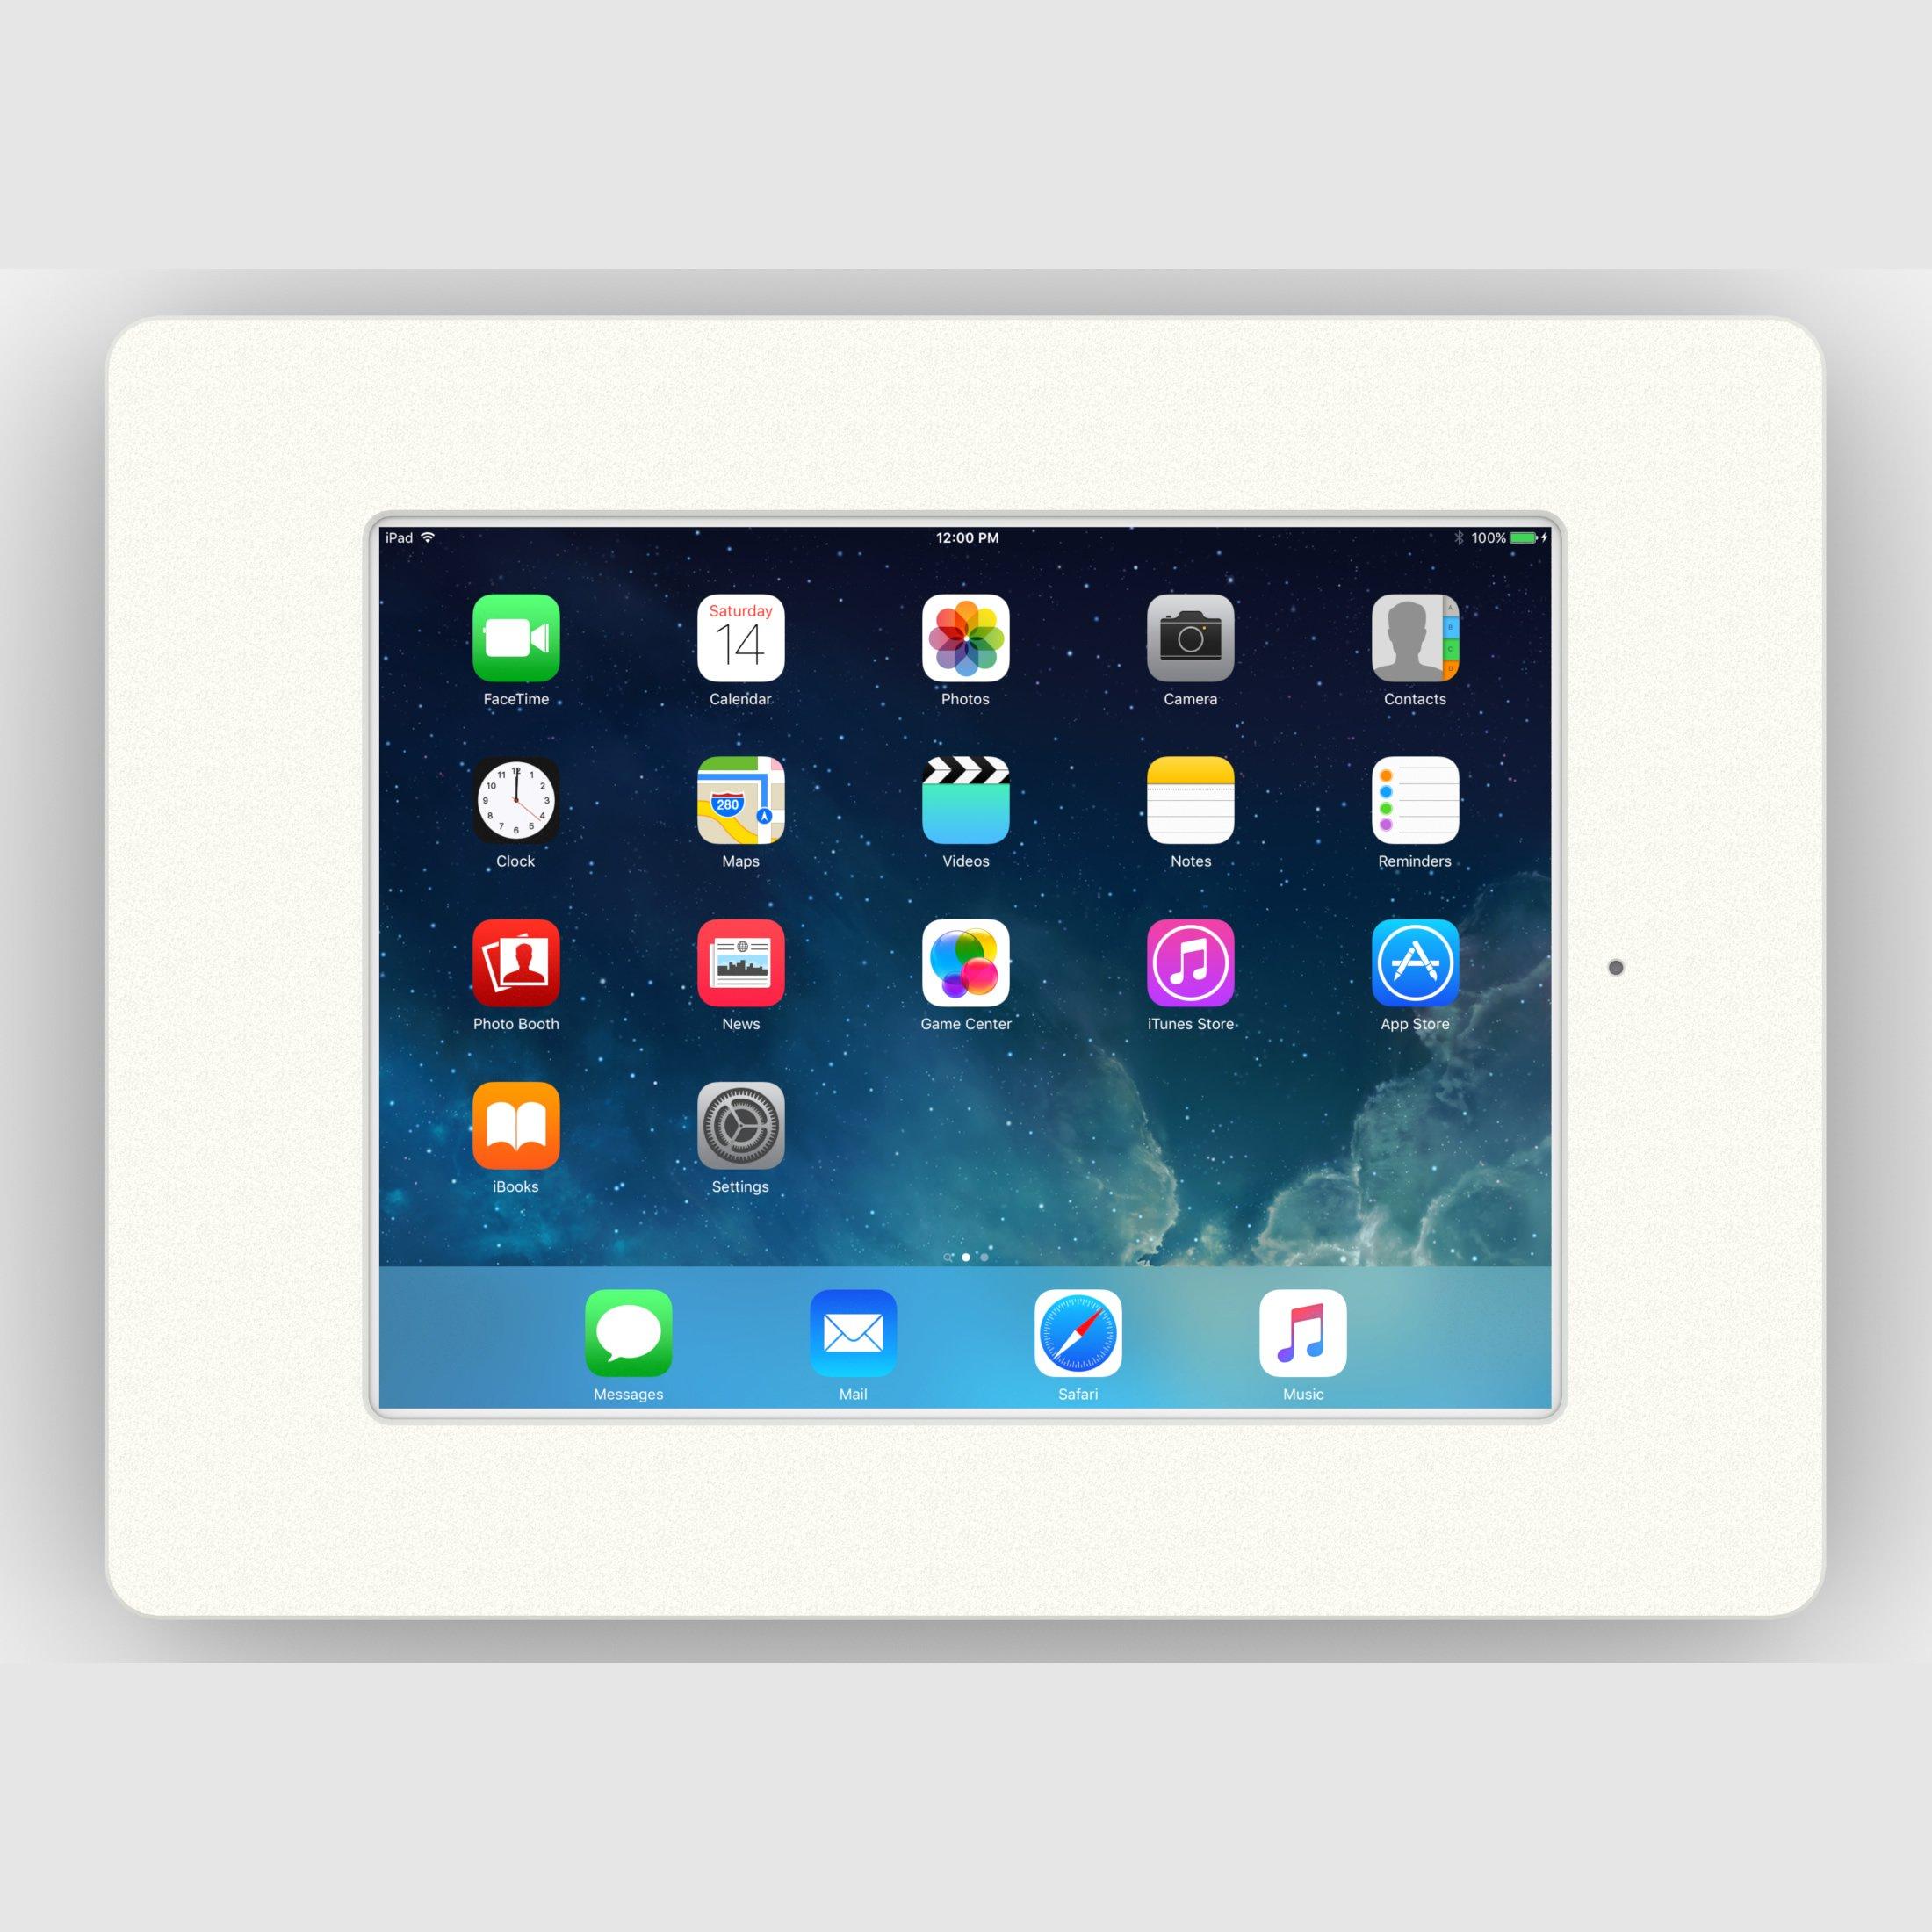 iPad (5th Gen) 9.7/Pro, Air 1/2 White Home Button Covered Fixed Slim VESA Wall Mount [Bundle] by VidaBox Kiosks (Image #2)